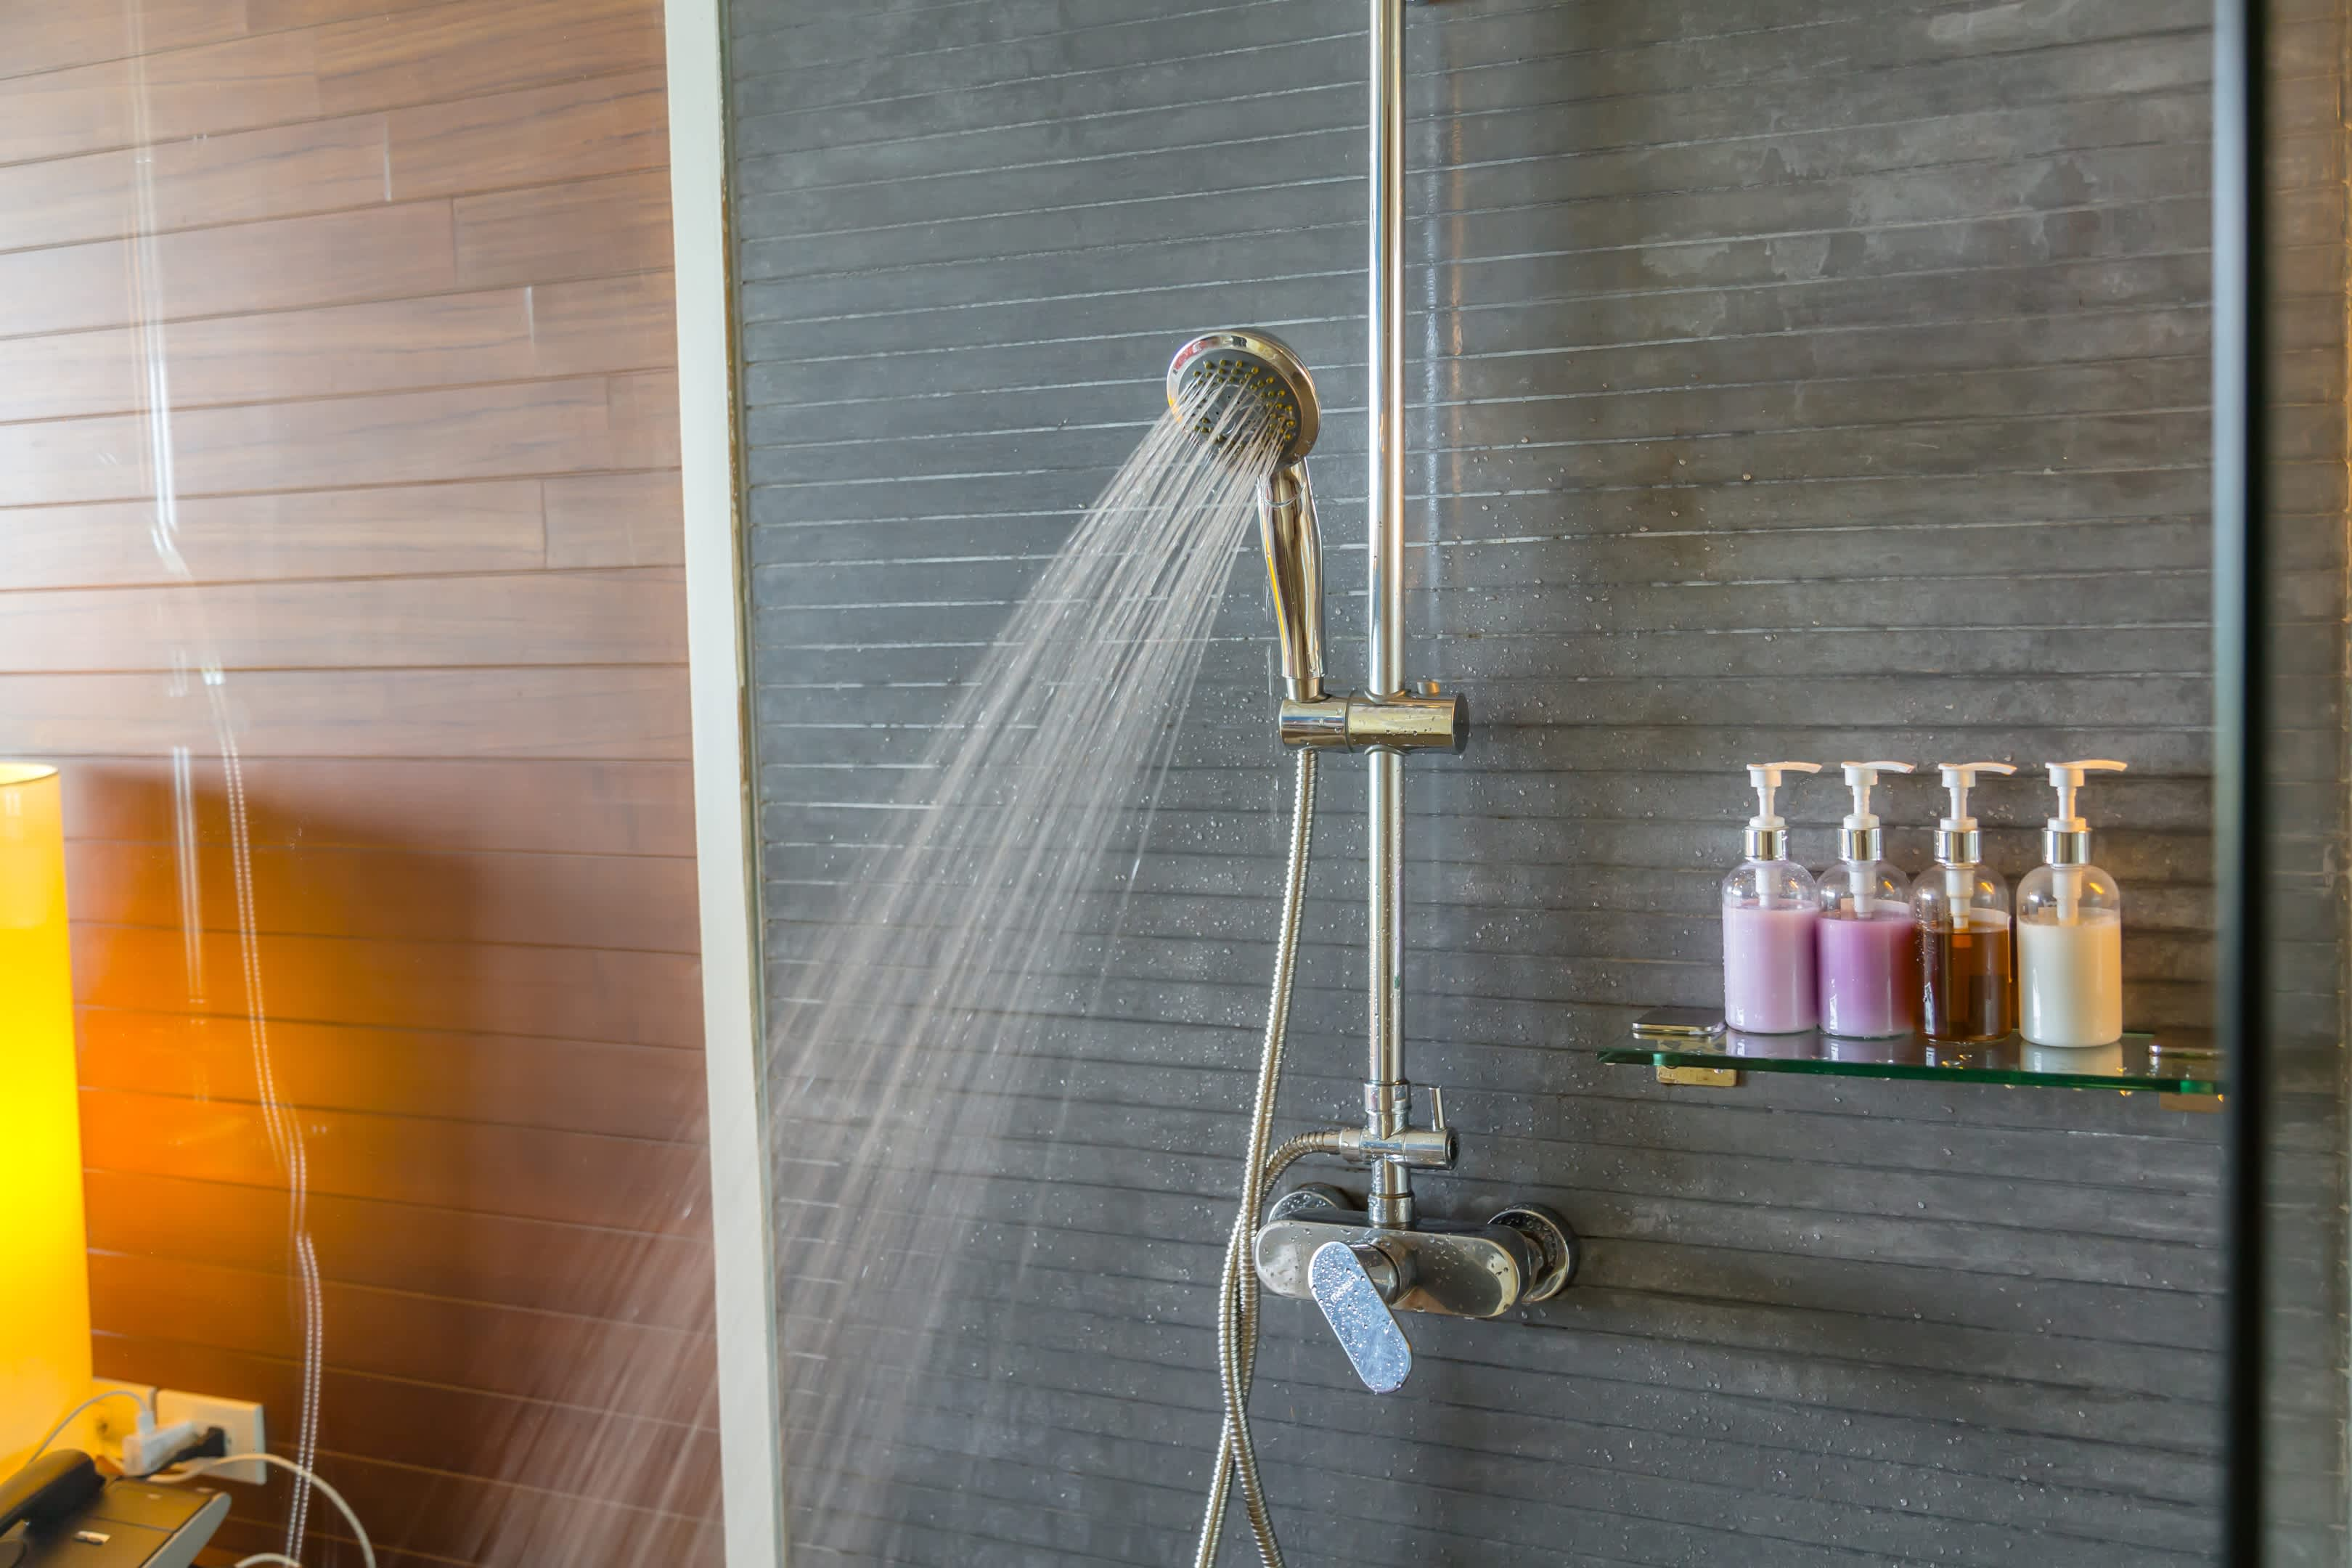 Grace Bathrooms Ltd - Bathroom Installer Fitter in Derby